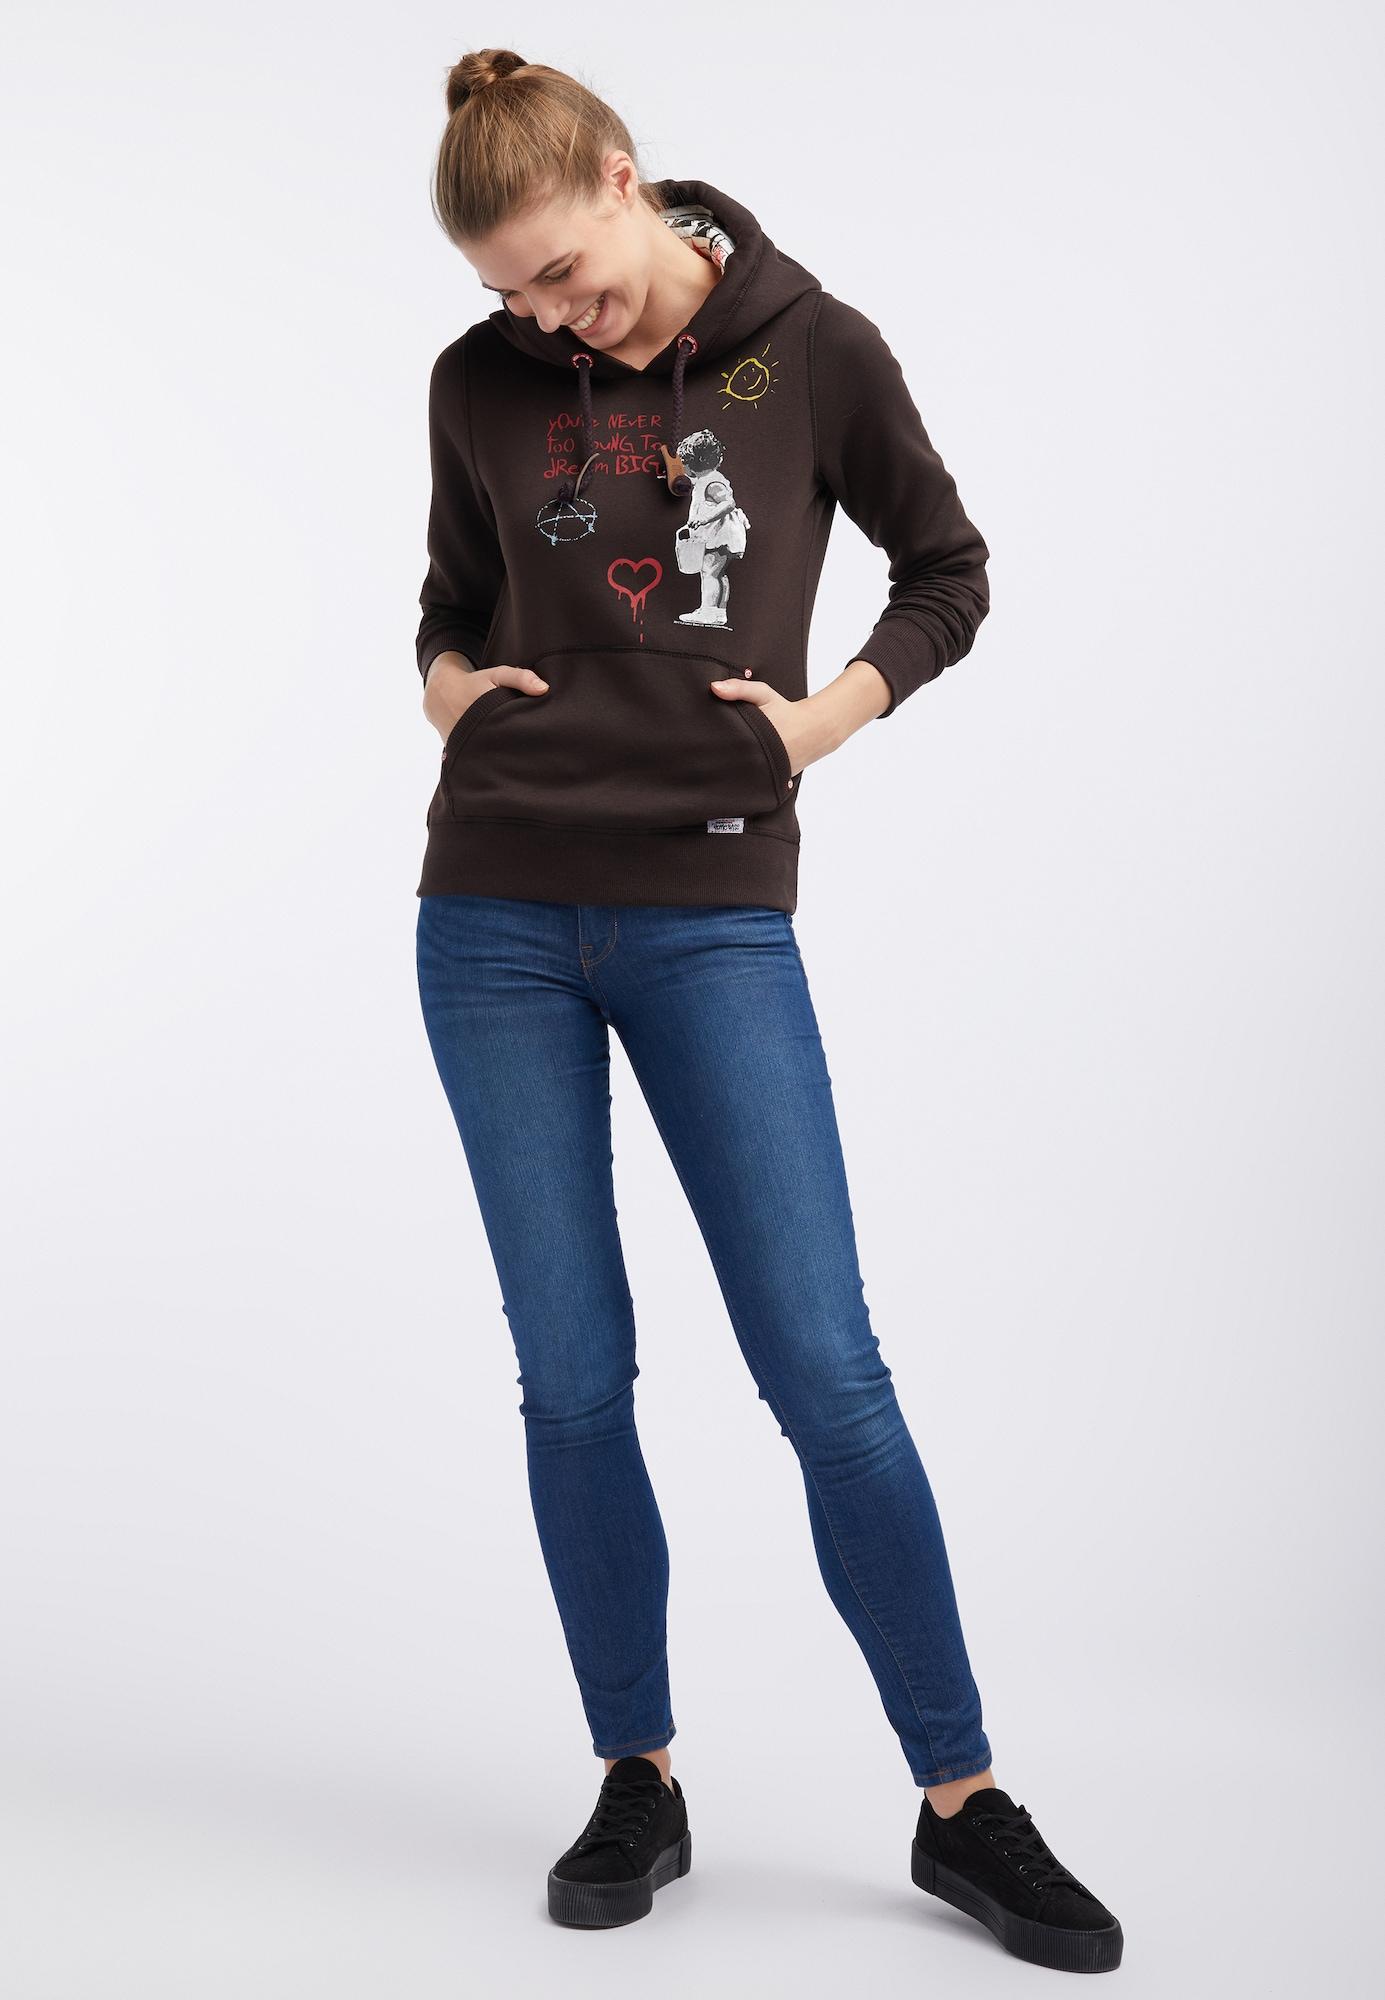 HOMEBASE, Damen Sweatshirt, bruin / gemengde kleuren